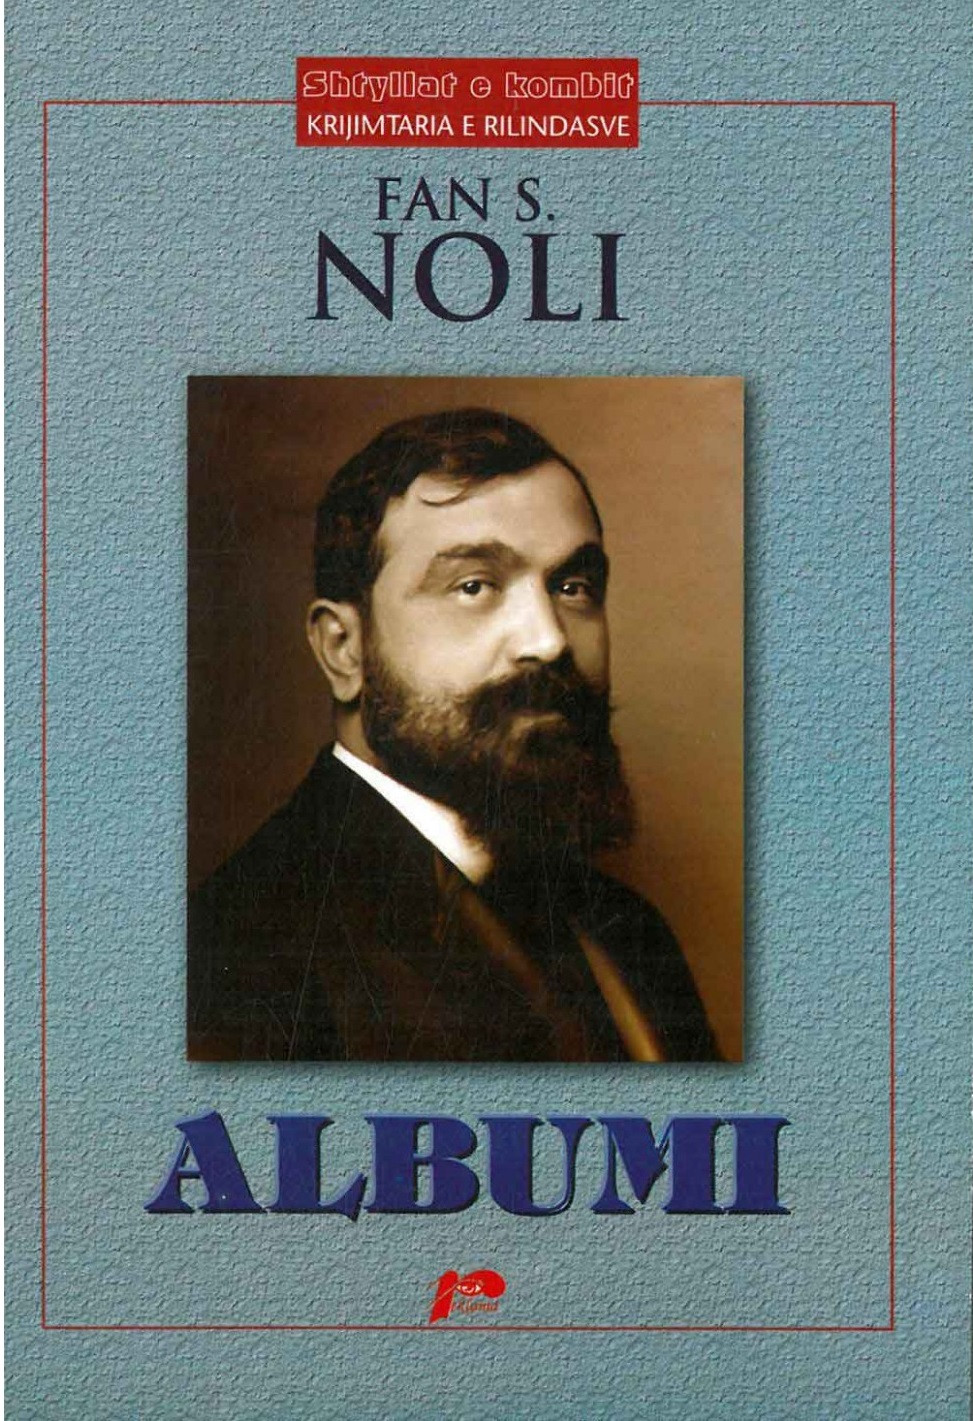 Albumi Fan Noli